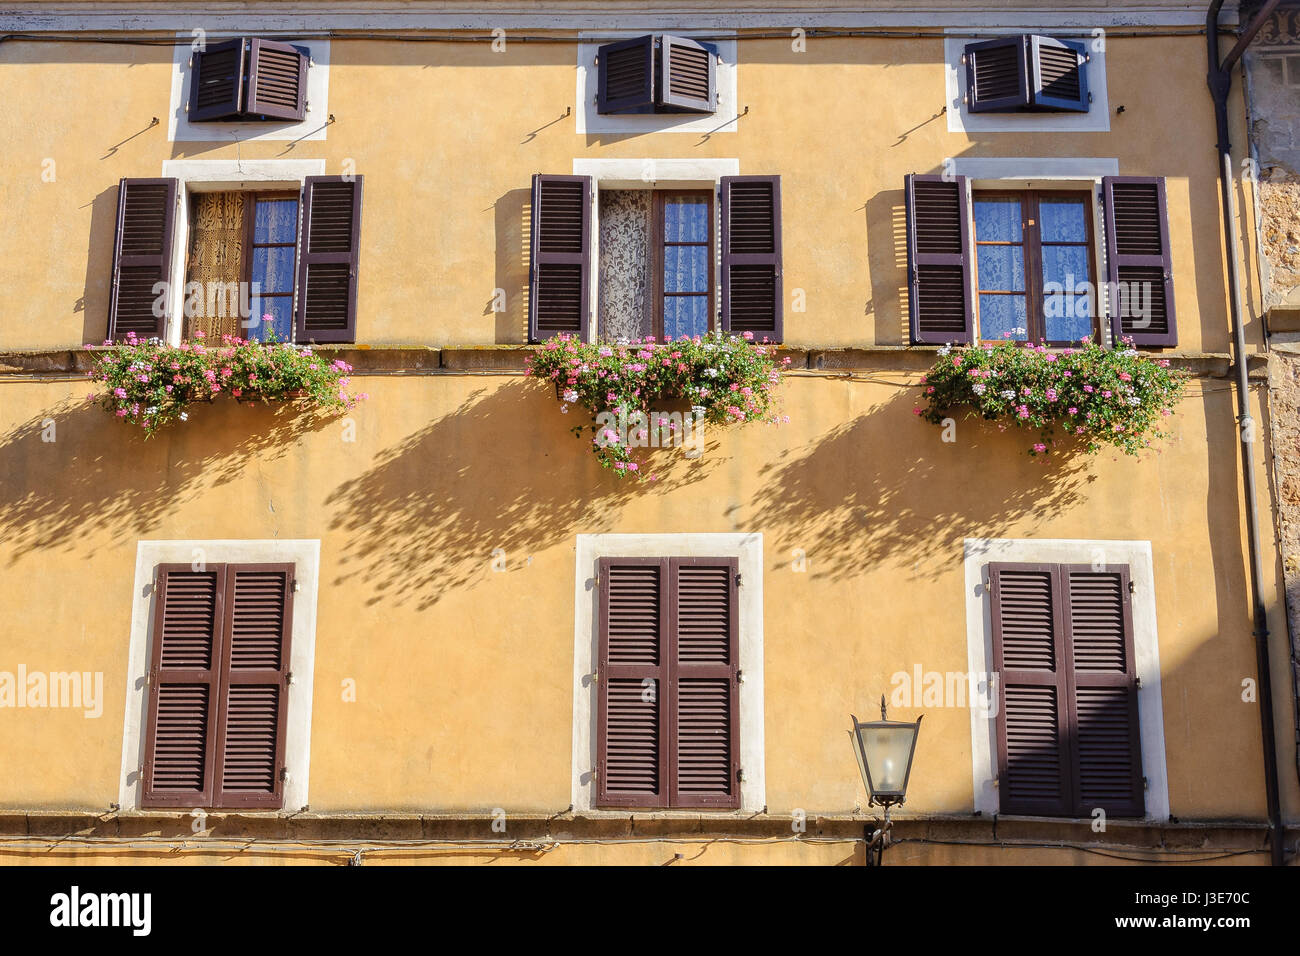 Fioriere Per Persiane ~ Fioriere per finestre con persiane: resultado de imagem para janelas